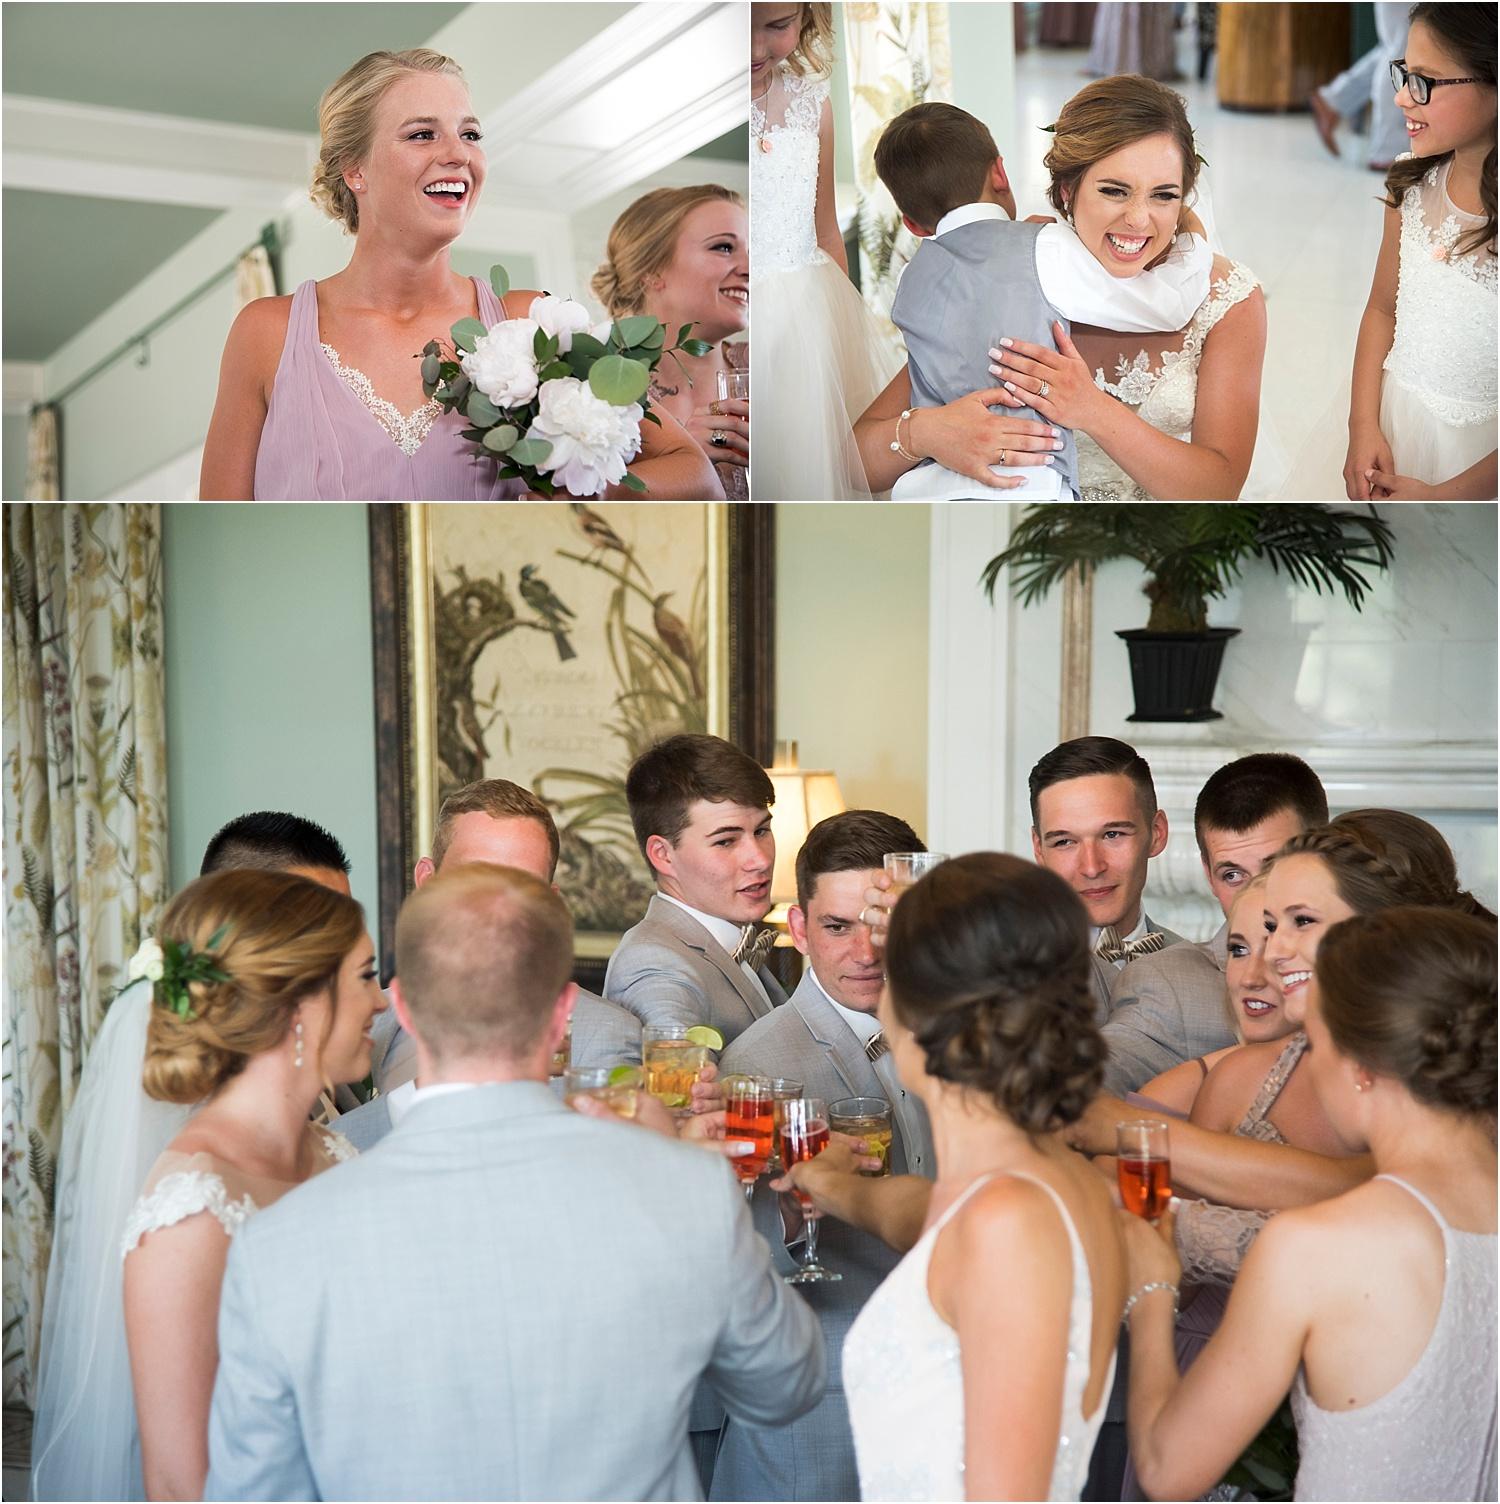 Colorado_Wedding_Highlands_Ranch_Mansion_Photography_Weddings_Photographer_031.jpg